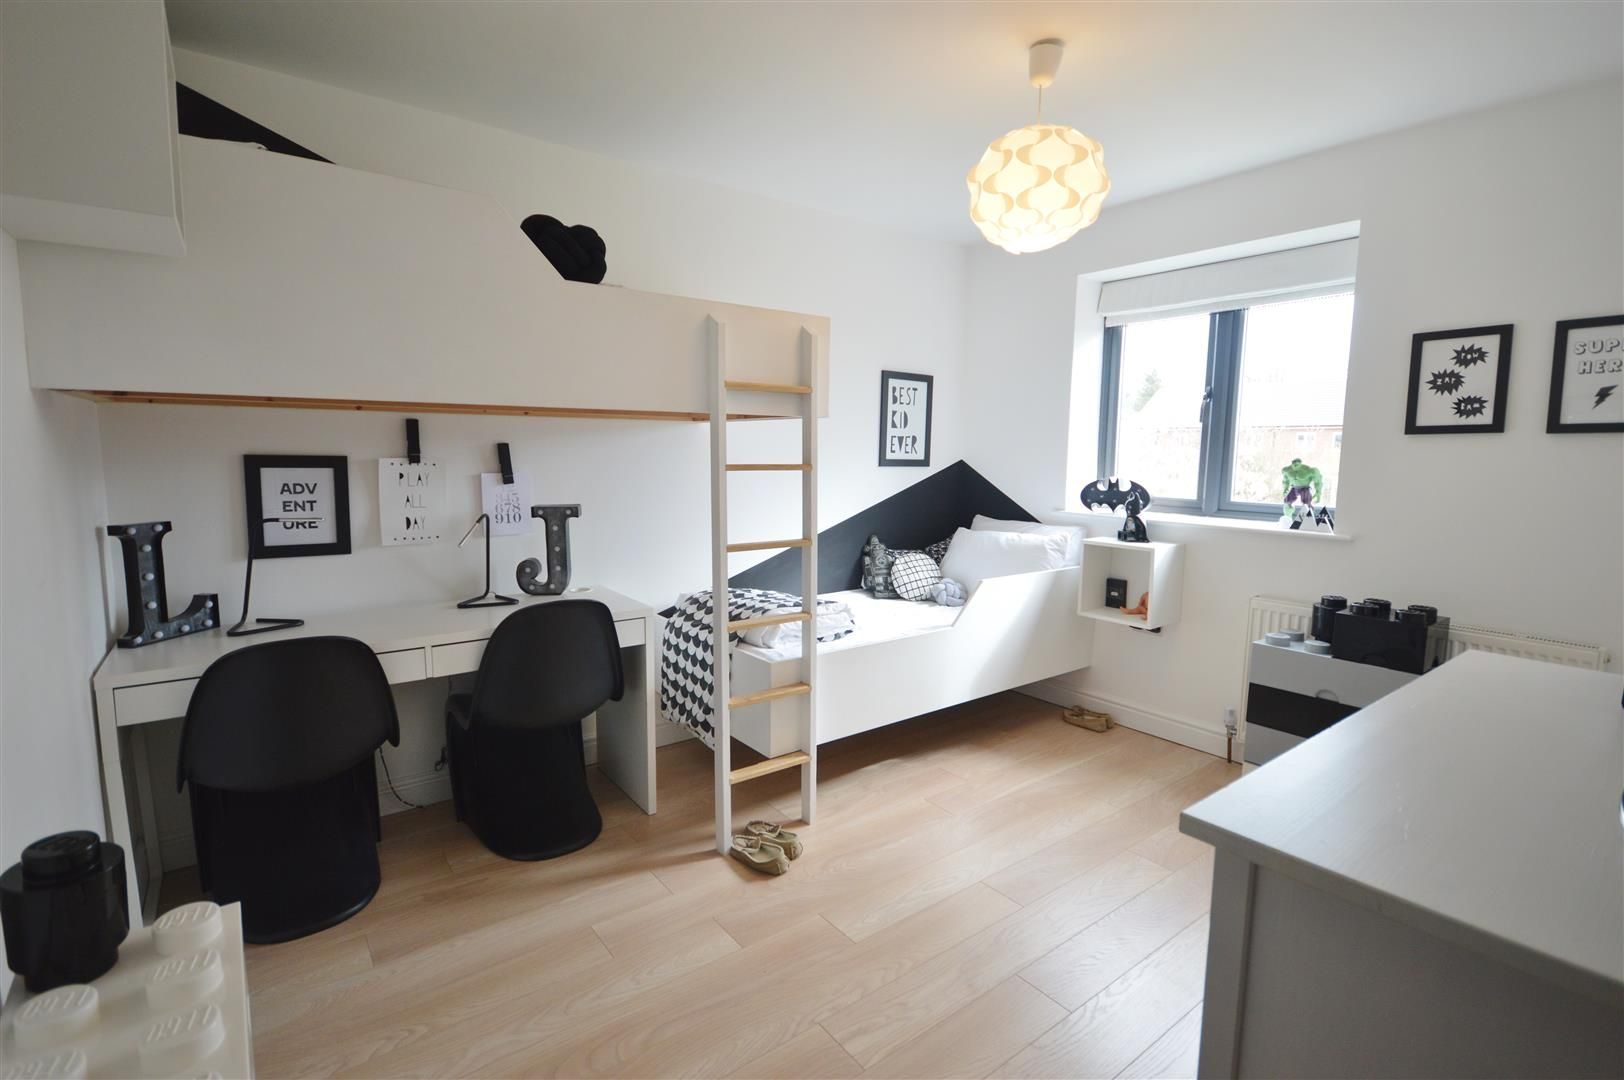 5 bed detached for sale in Leominster  - Property Image 11